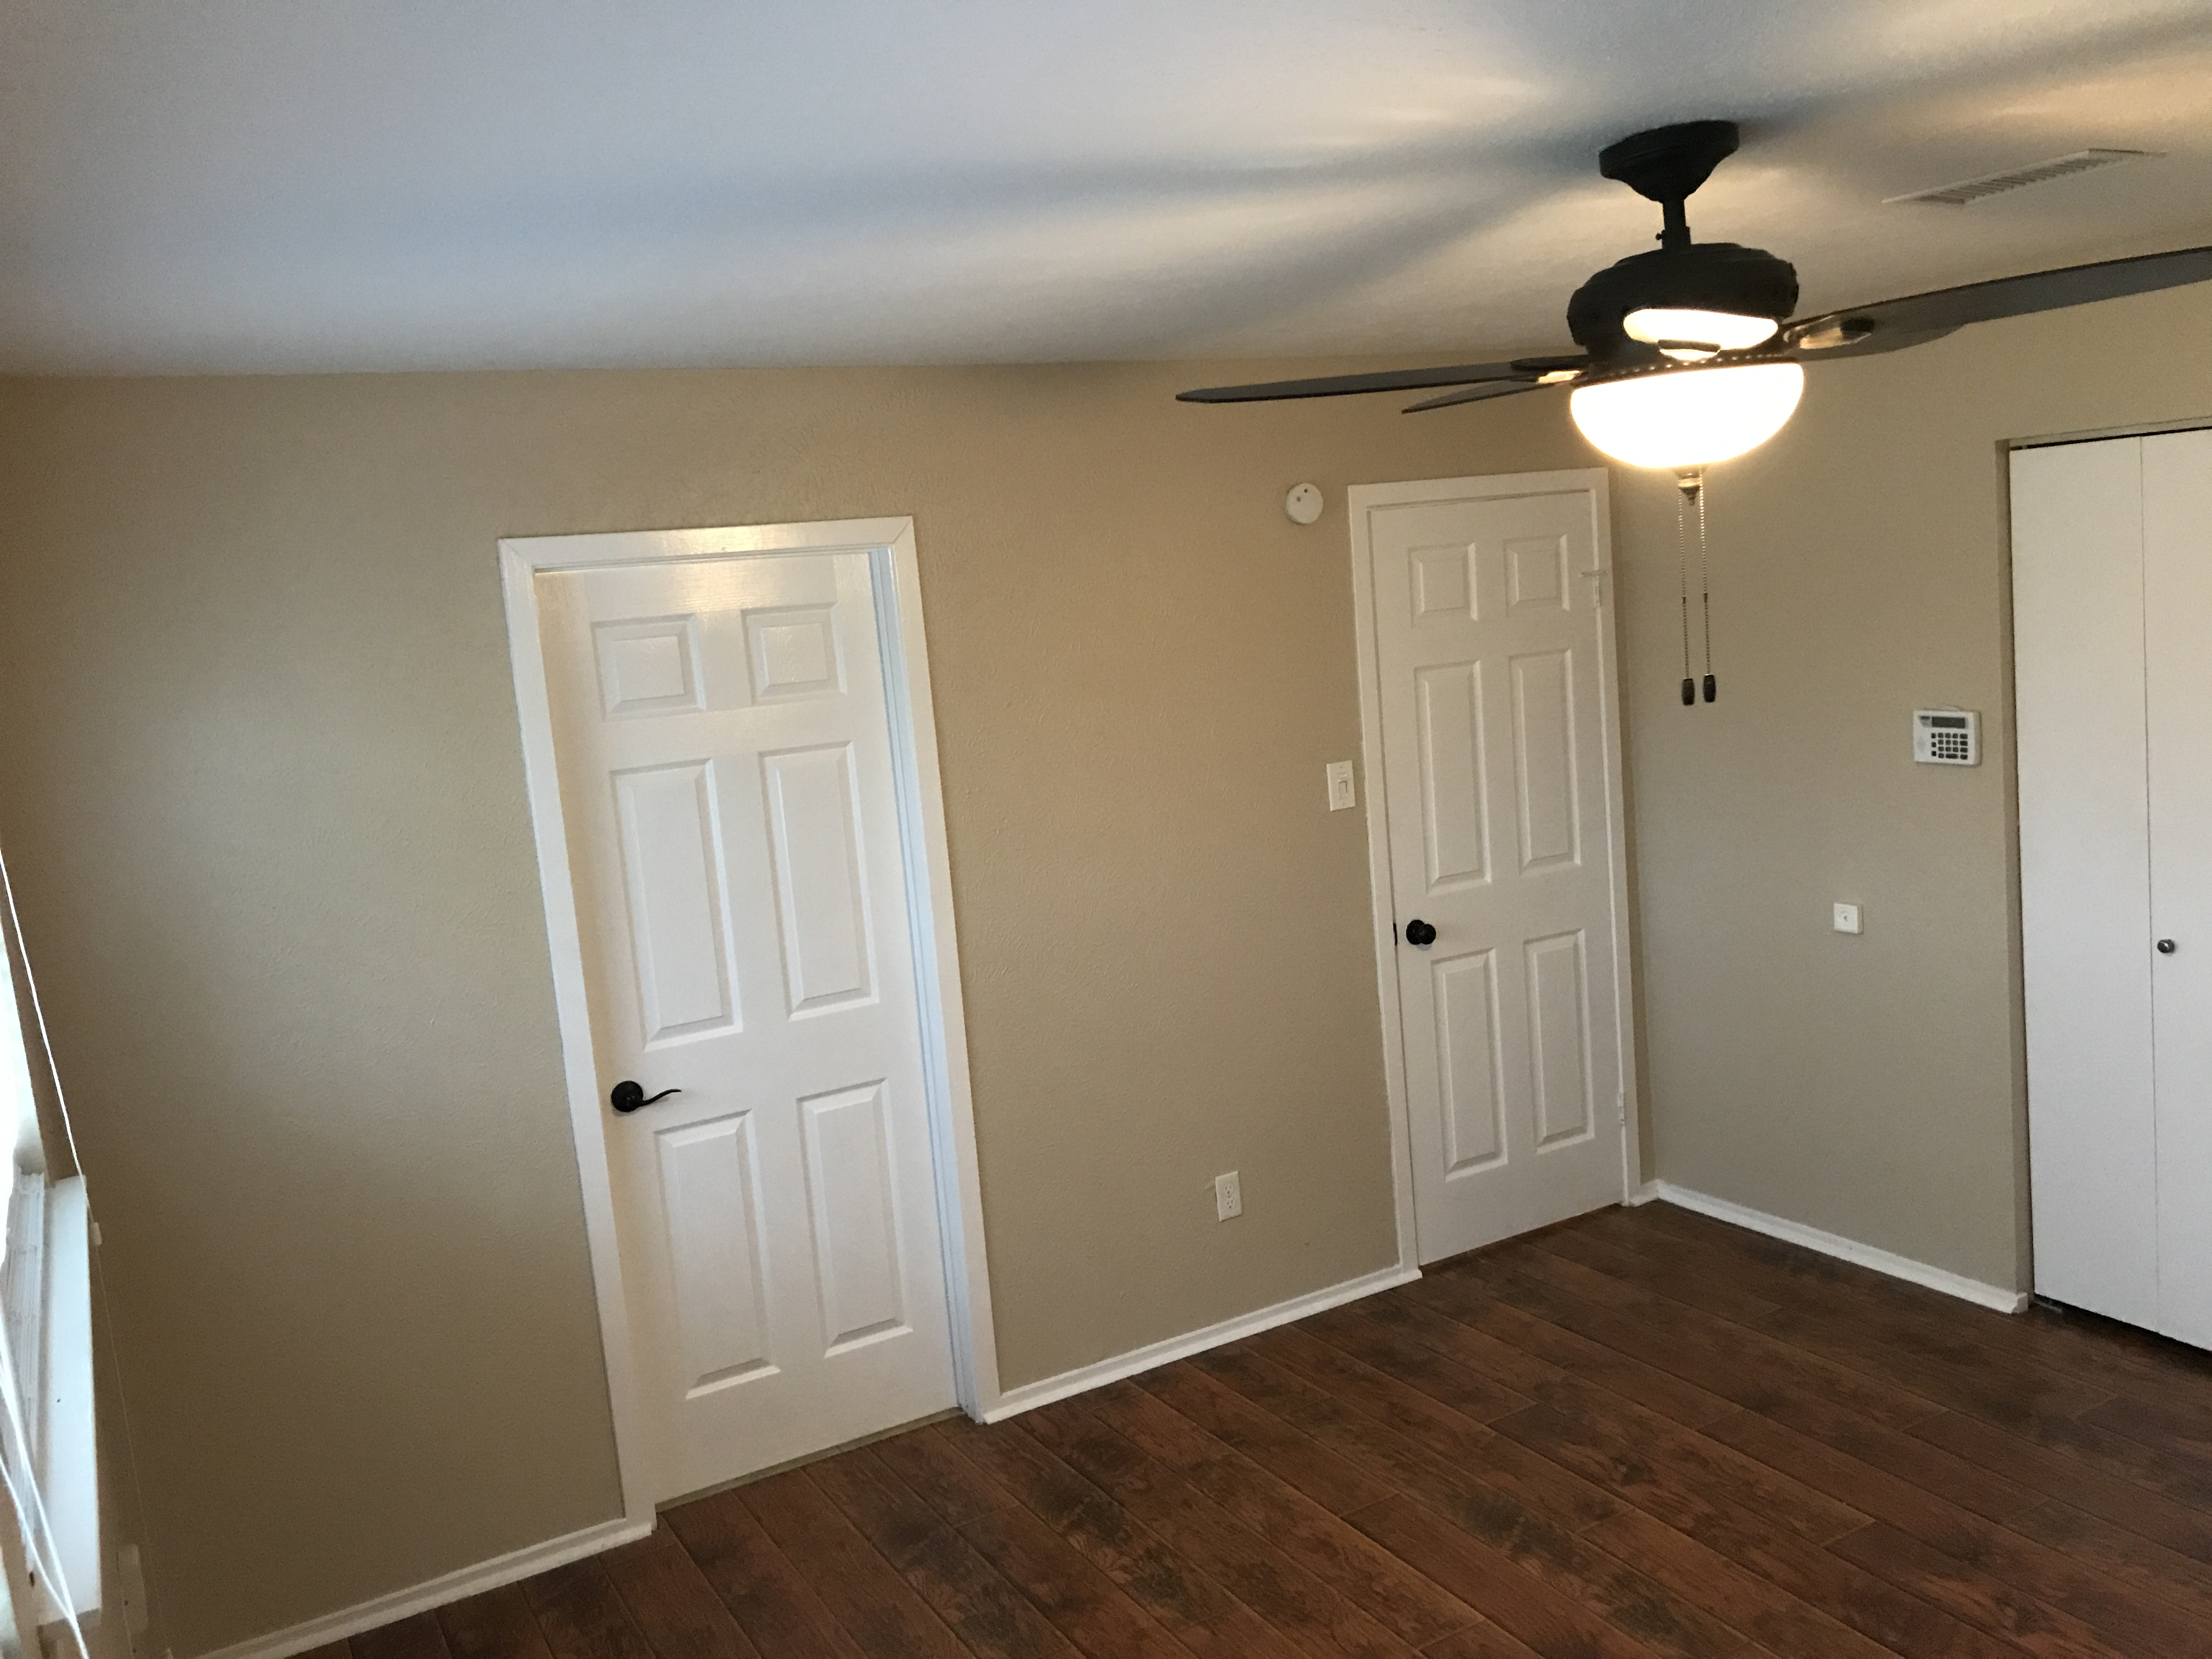 Photo of 524 Gleneagles Drive, Friendswood, TX 77546